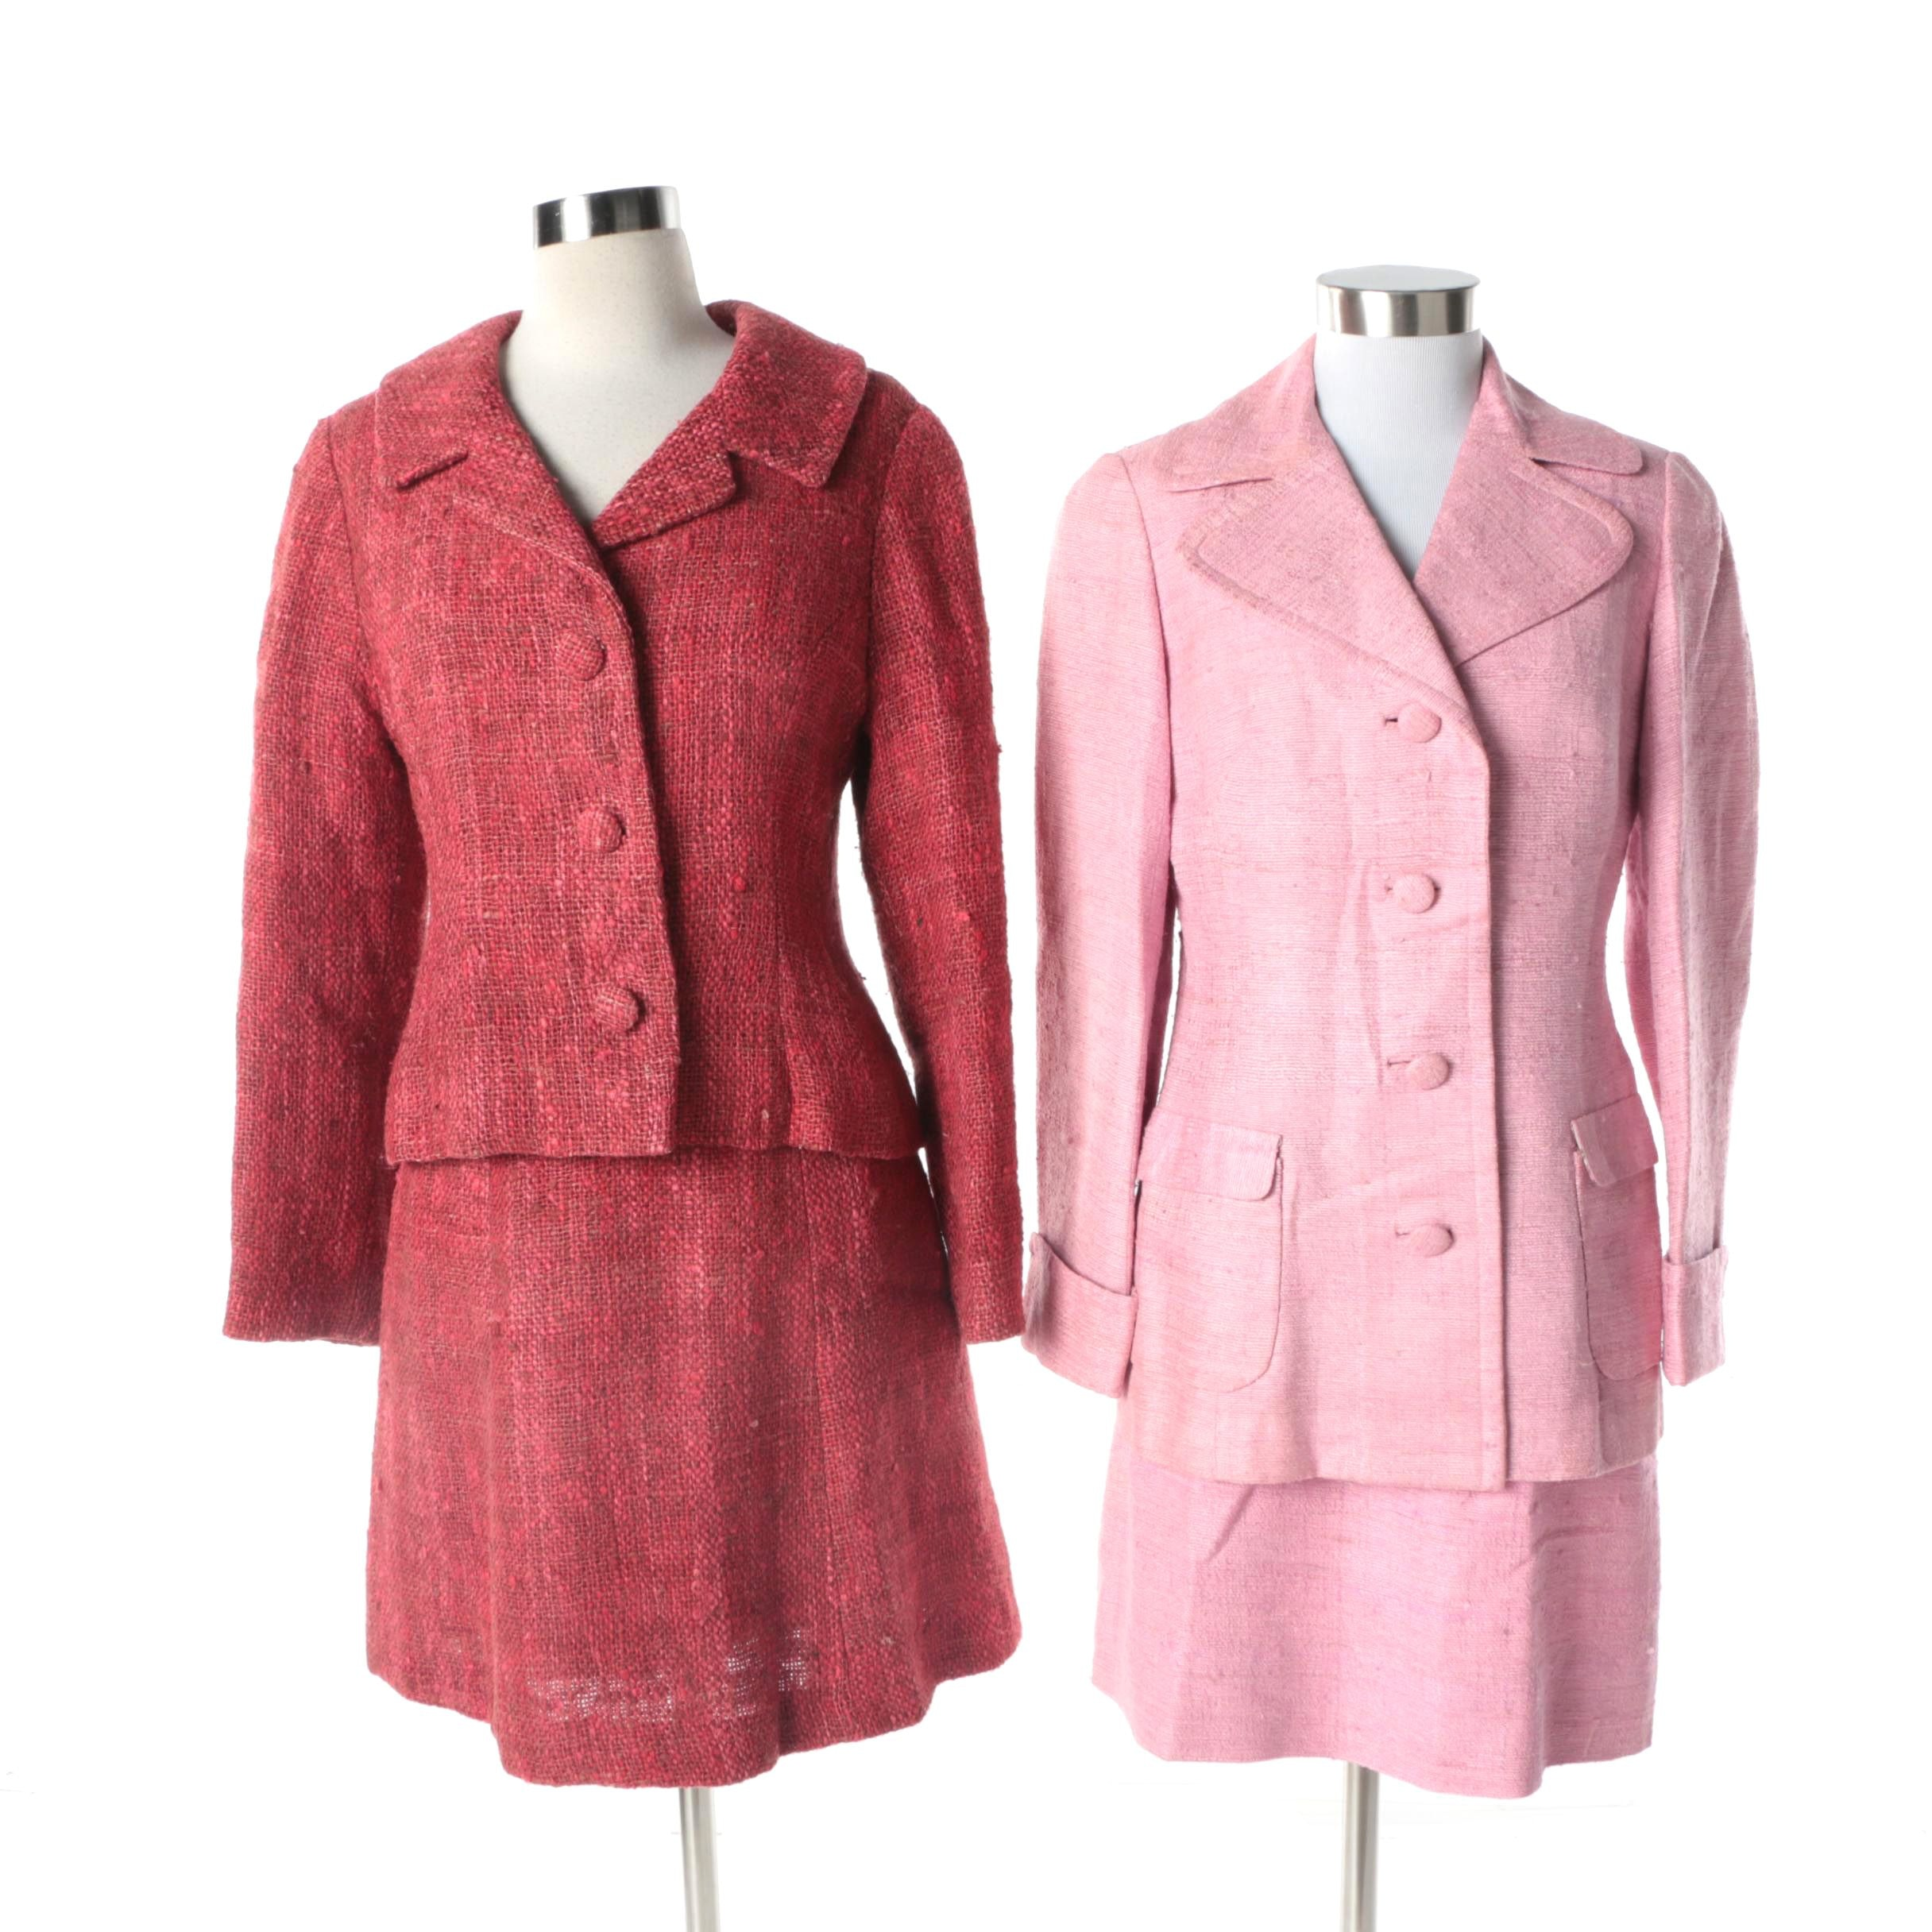 Vintage Wool Blend Skirt Suits Including Francia